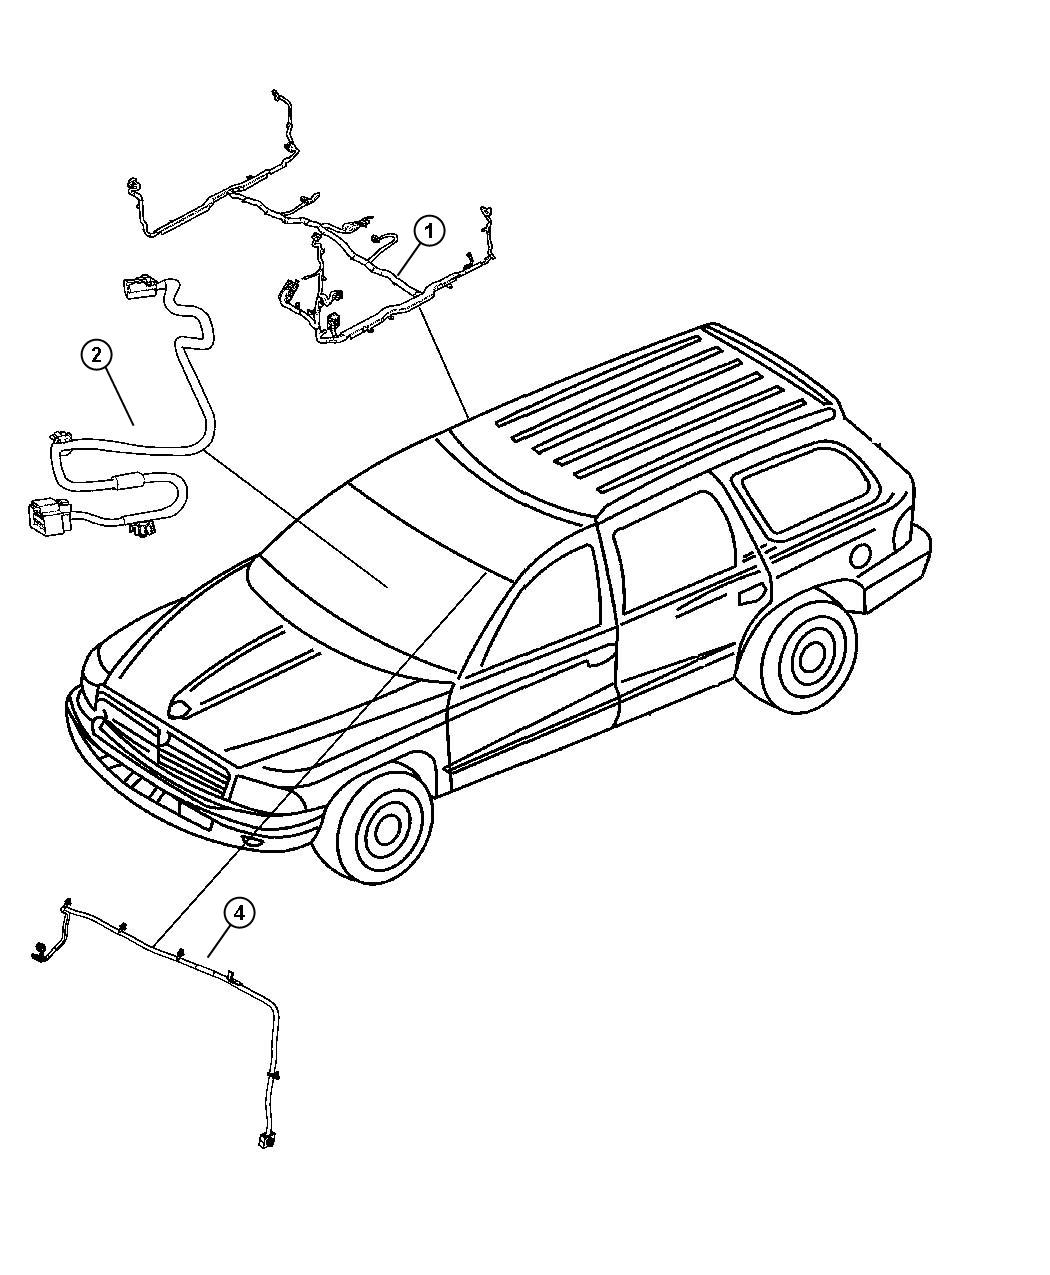 2008 Chrysler Aspen Wiring. Body. Interior. [hbb, cgs, jpm